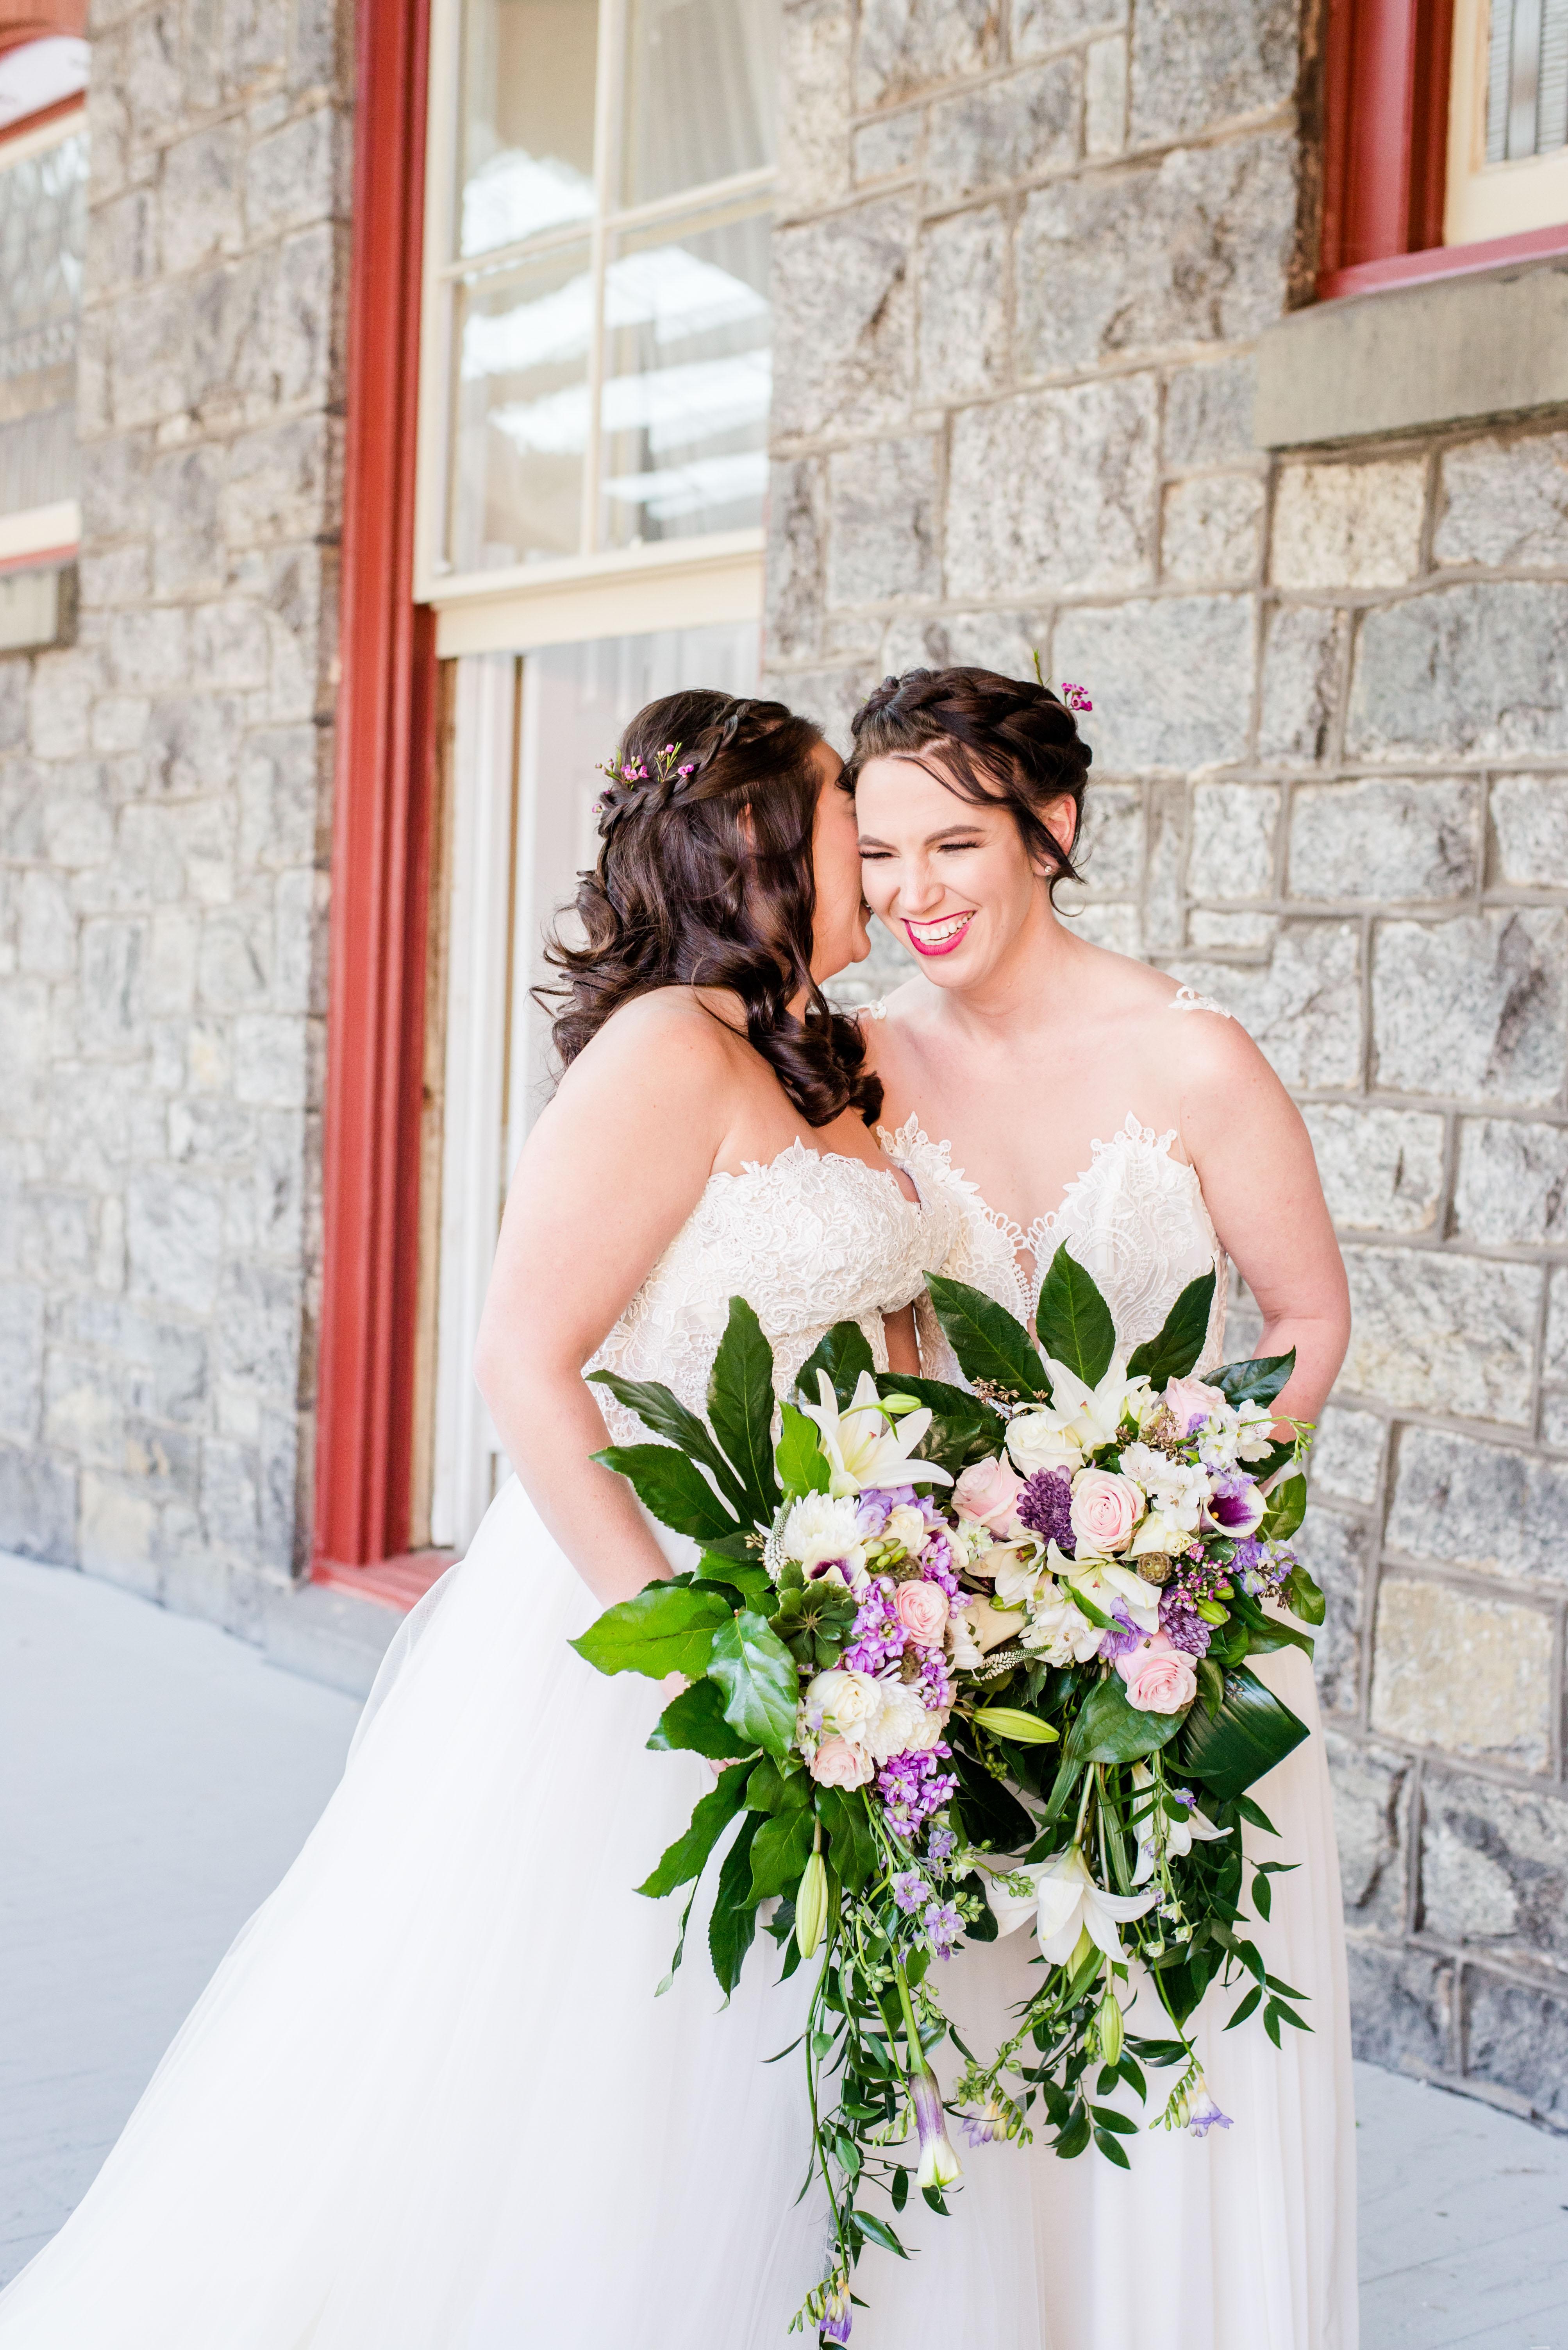 Baldwin-School-Wedding-Photographer-Event-Venue-Pennsylvania-Mainline-Andrea-Krout-Photography-11